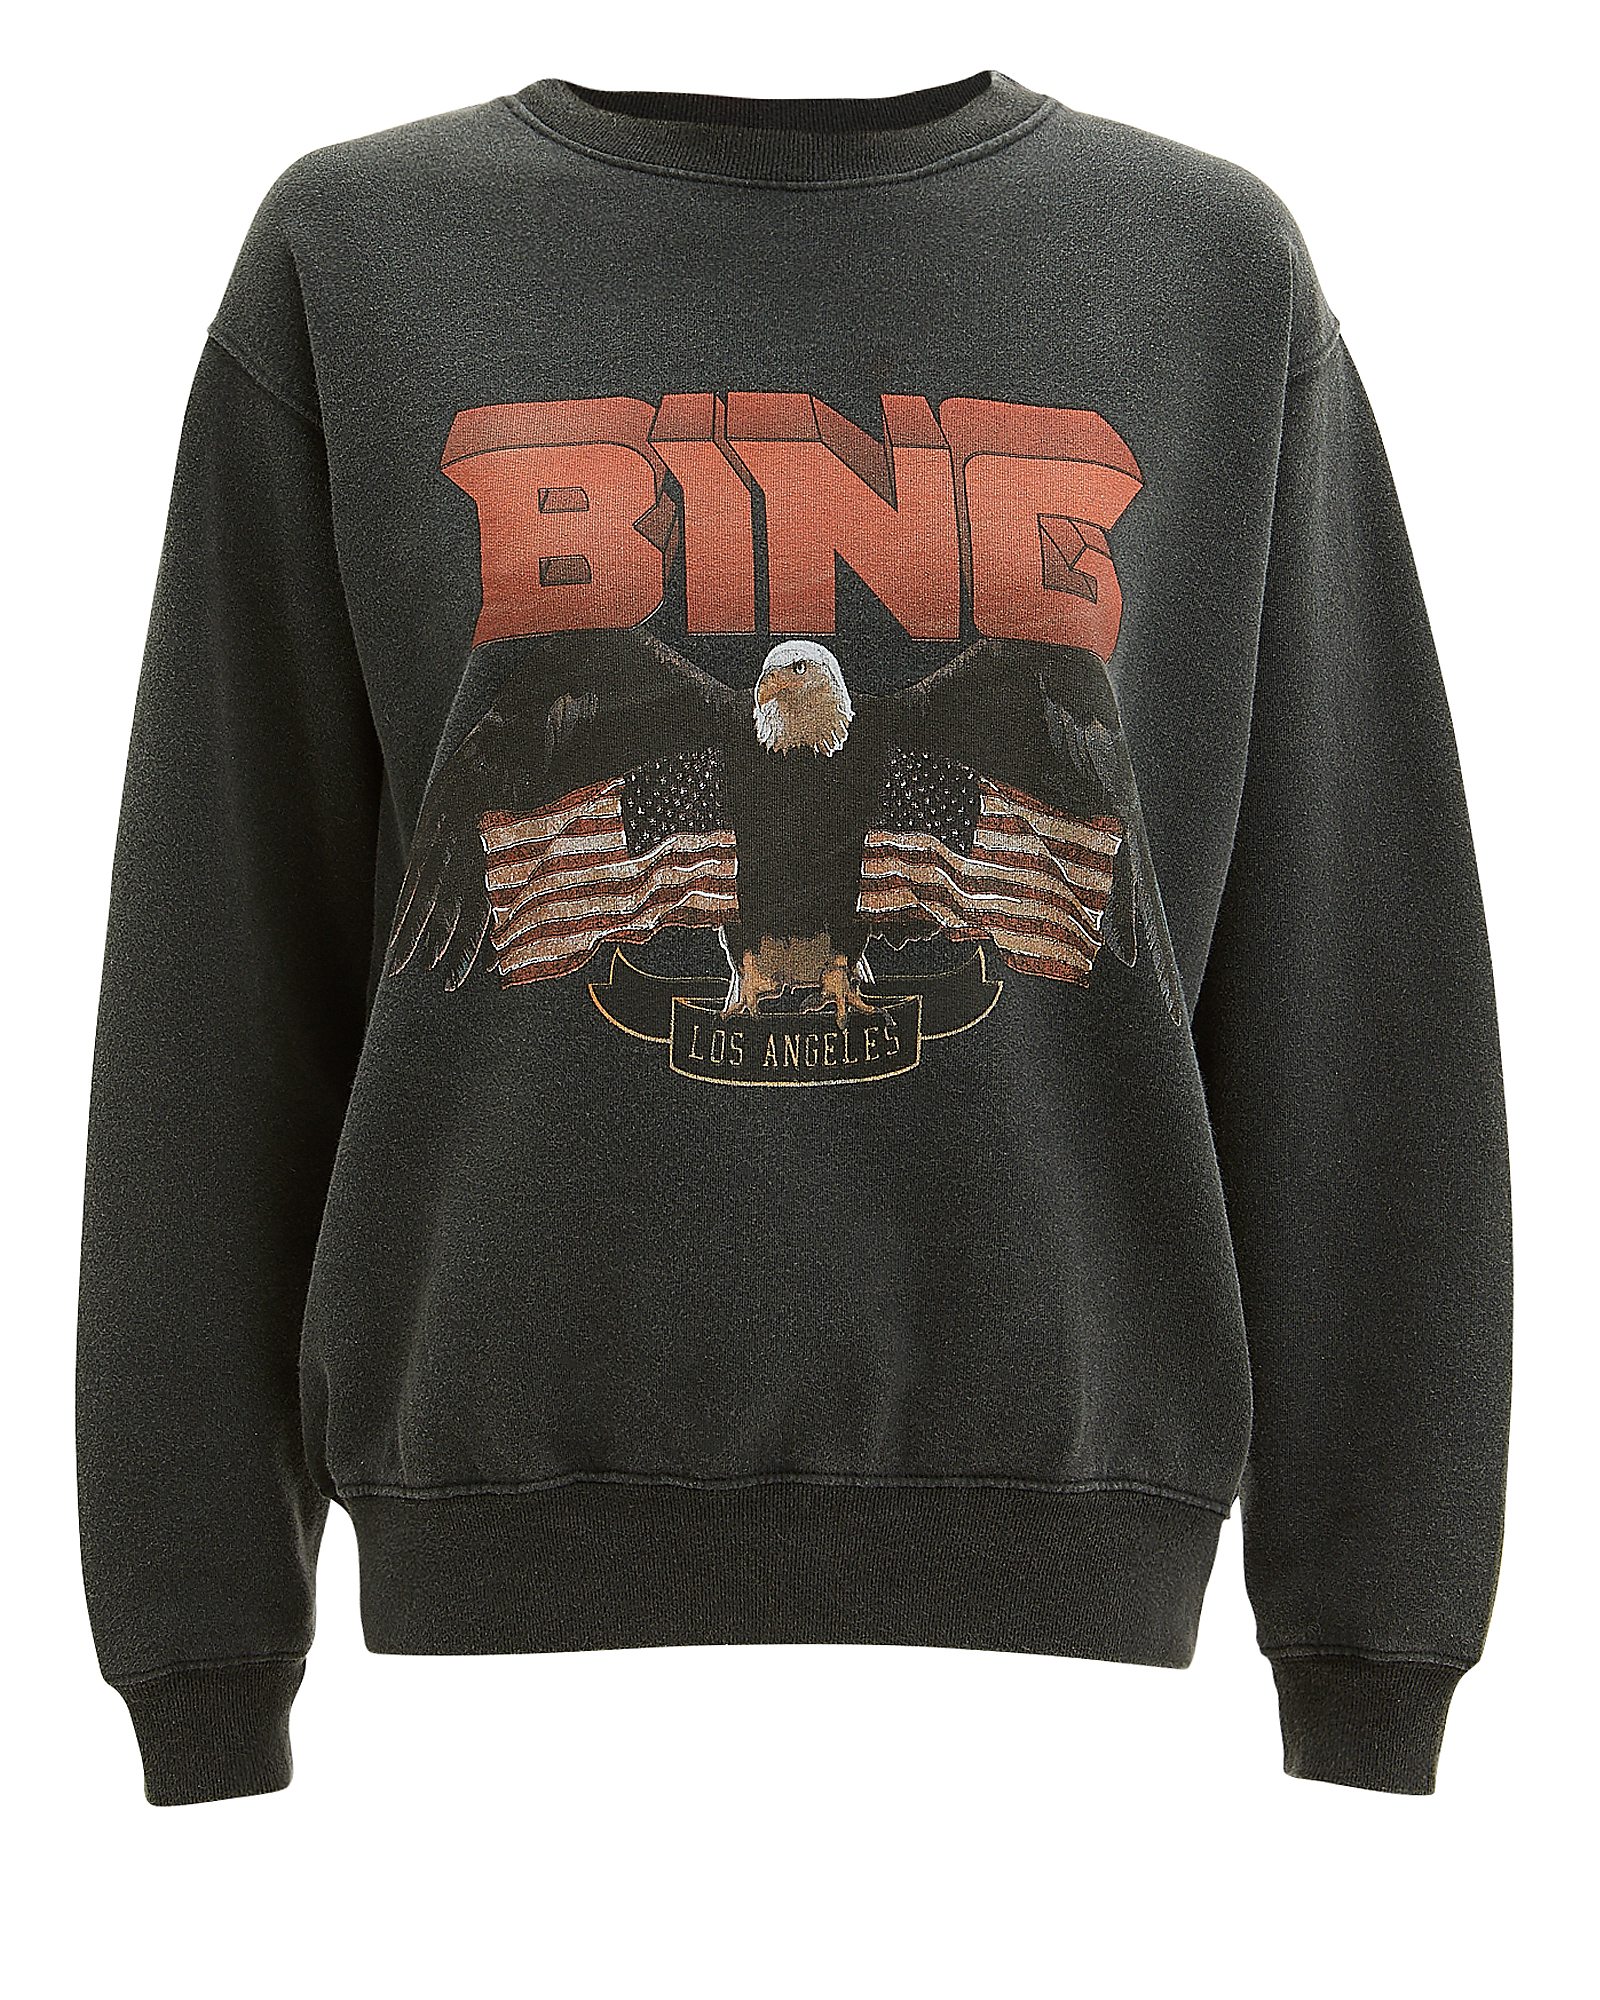 ANINE BING Vintage Eagle-Graphic Sweatshirt in Black